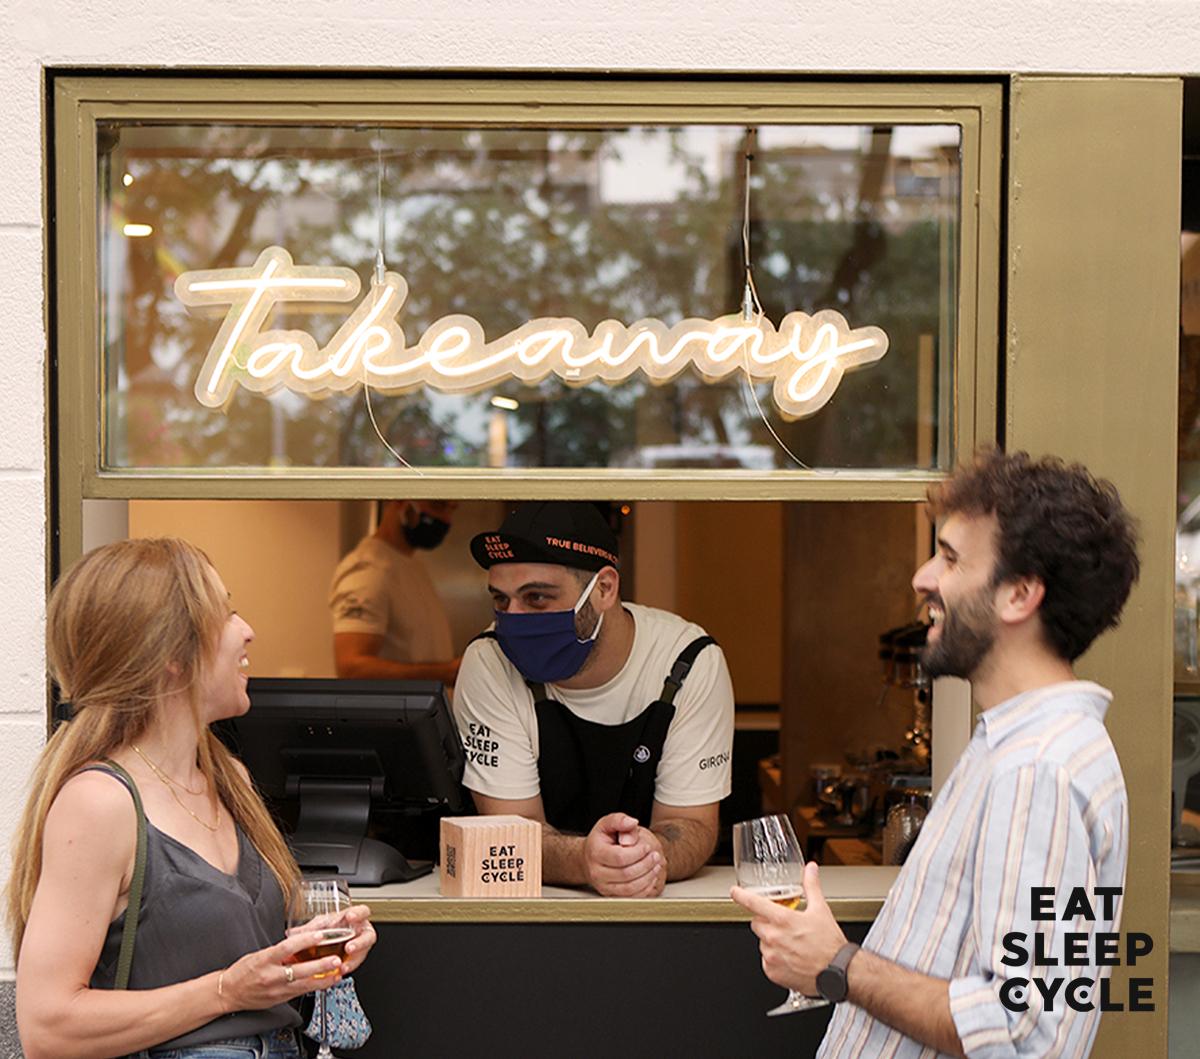 Eat-Sleep-Cycle-Hub-Cafe-Cyclist-Guide